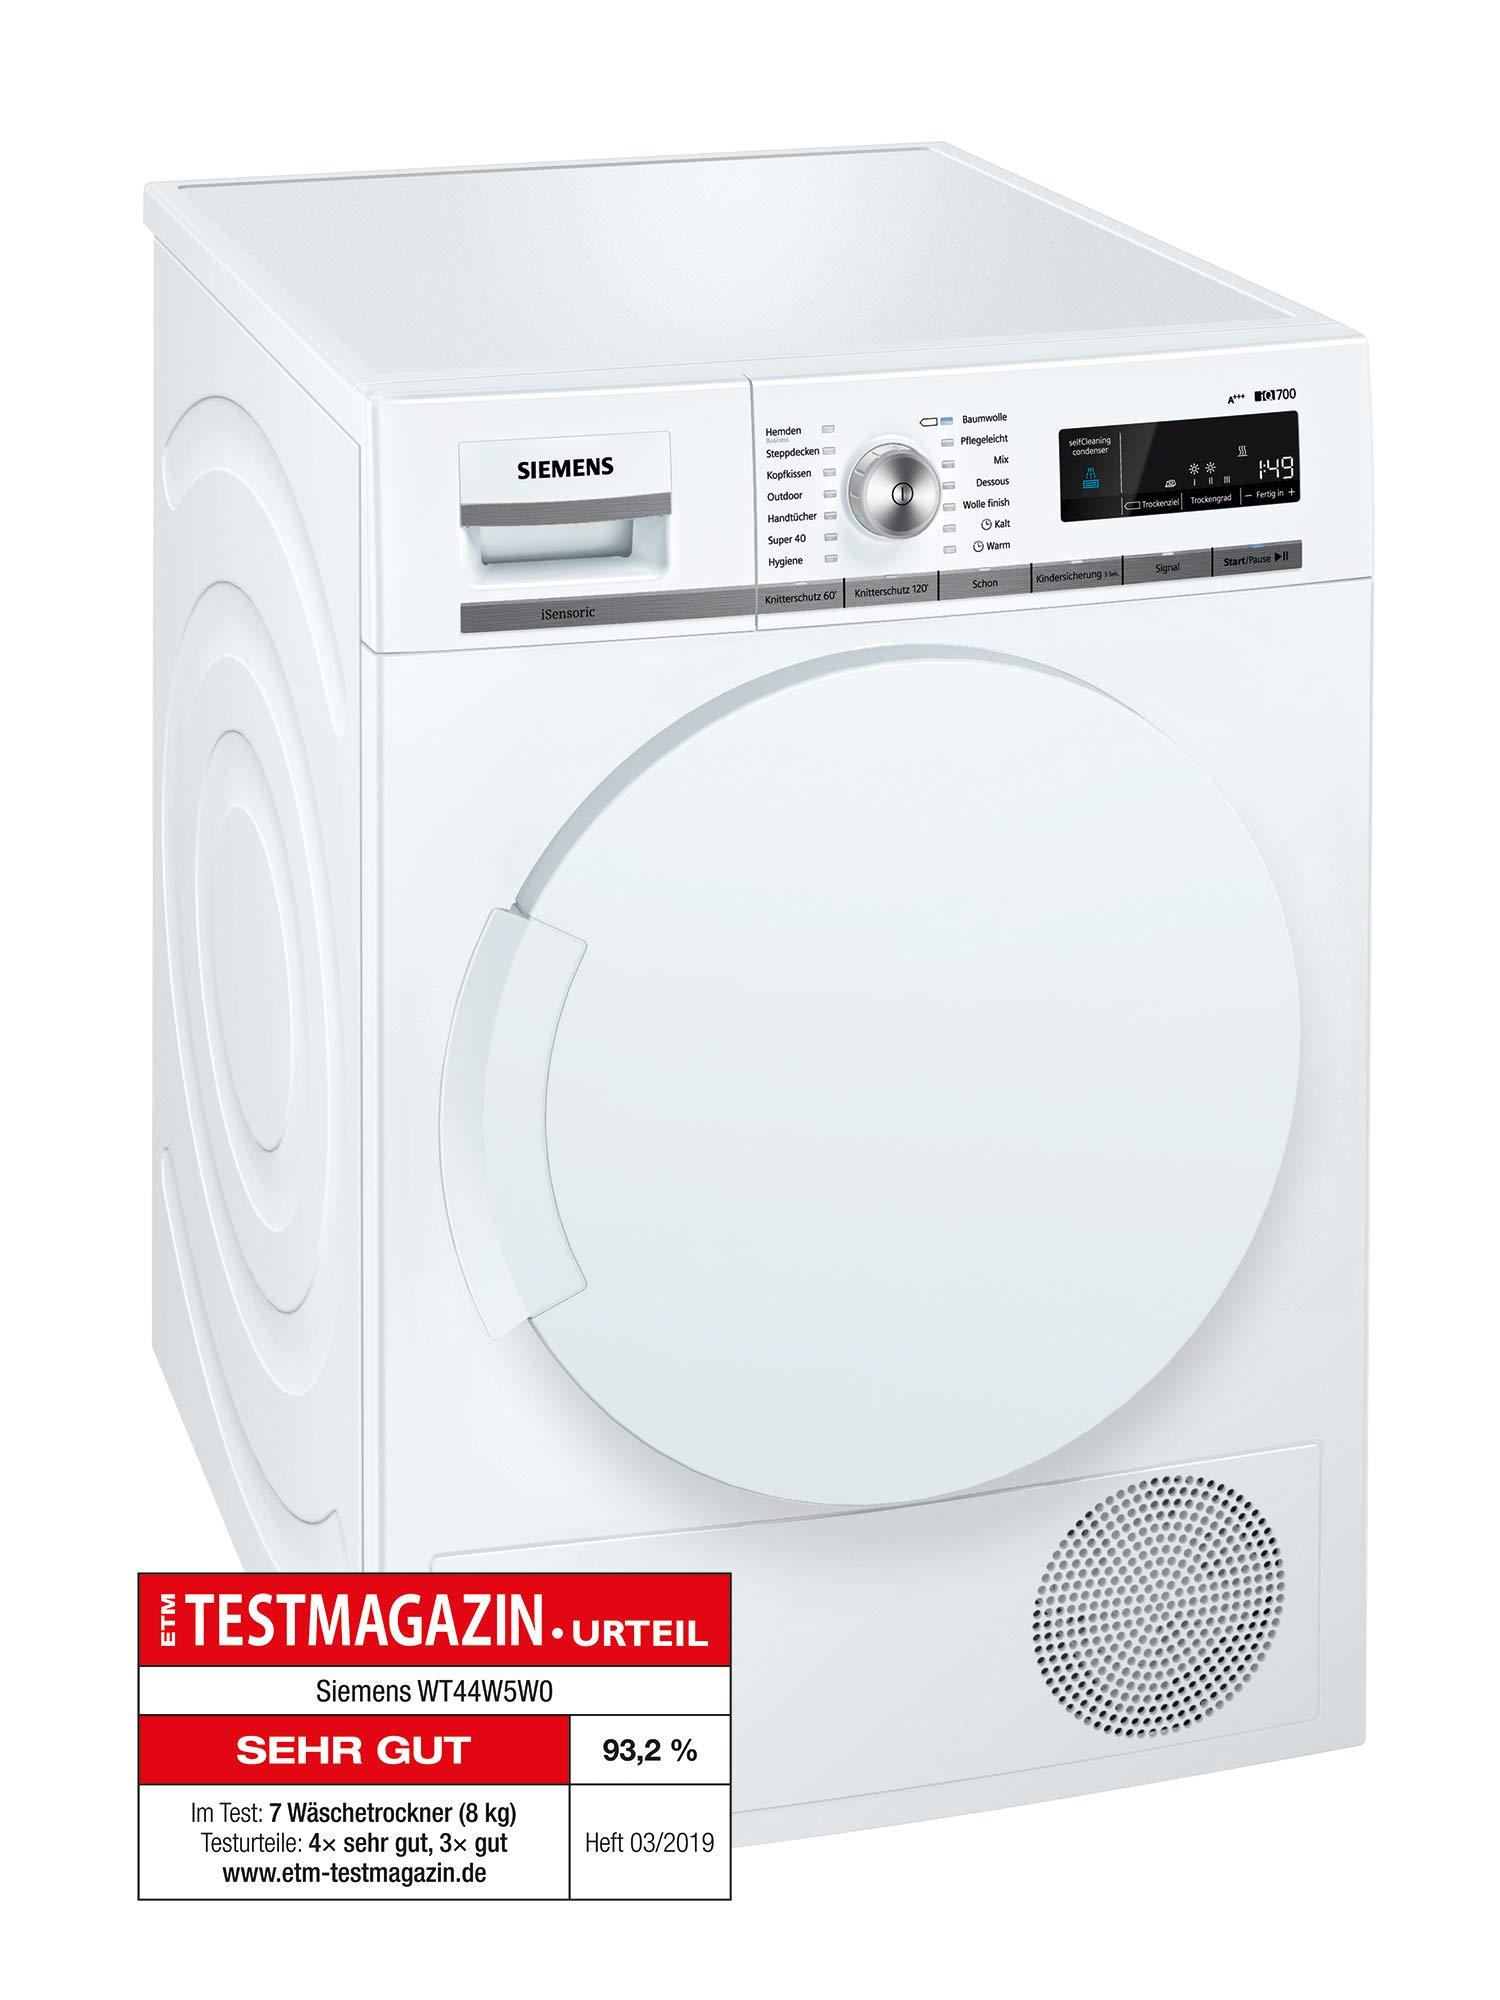 Siemens WT44W5W0 iQ700 iSensoric Premium Wärmepumpentrockner, 8 kg, weiß